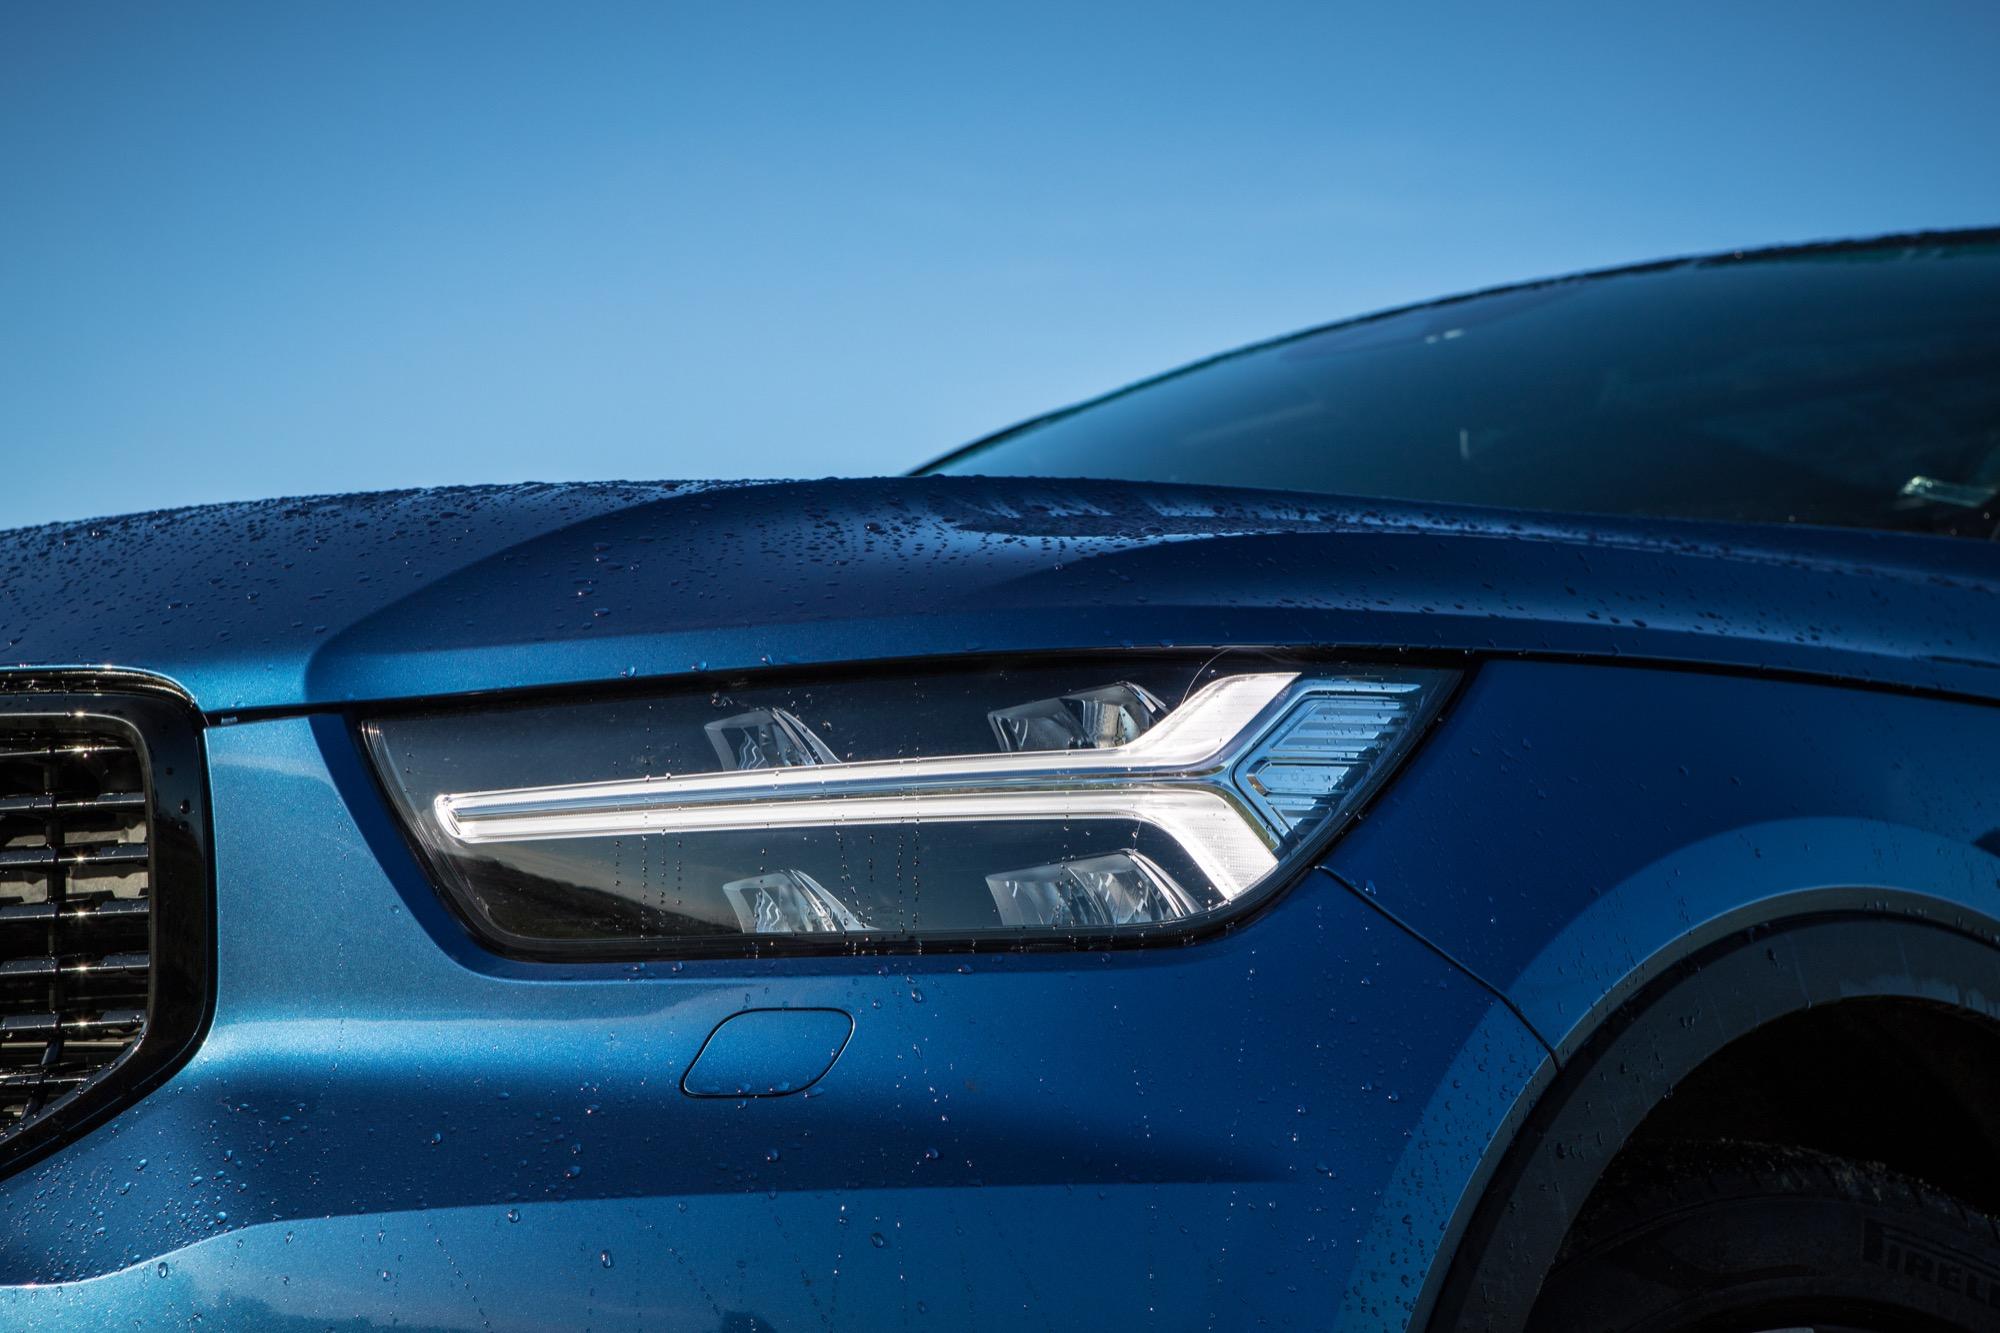 Essai Volvo Xc40 >> Volvo Xc40 Un Petit Suv A L Essai En Version T5 Awd